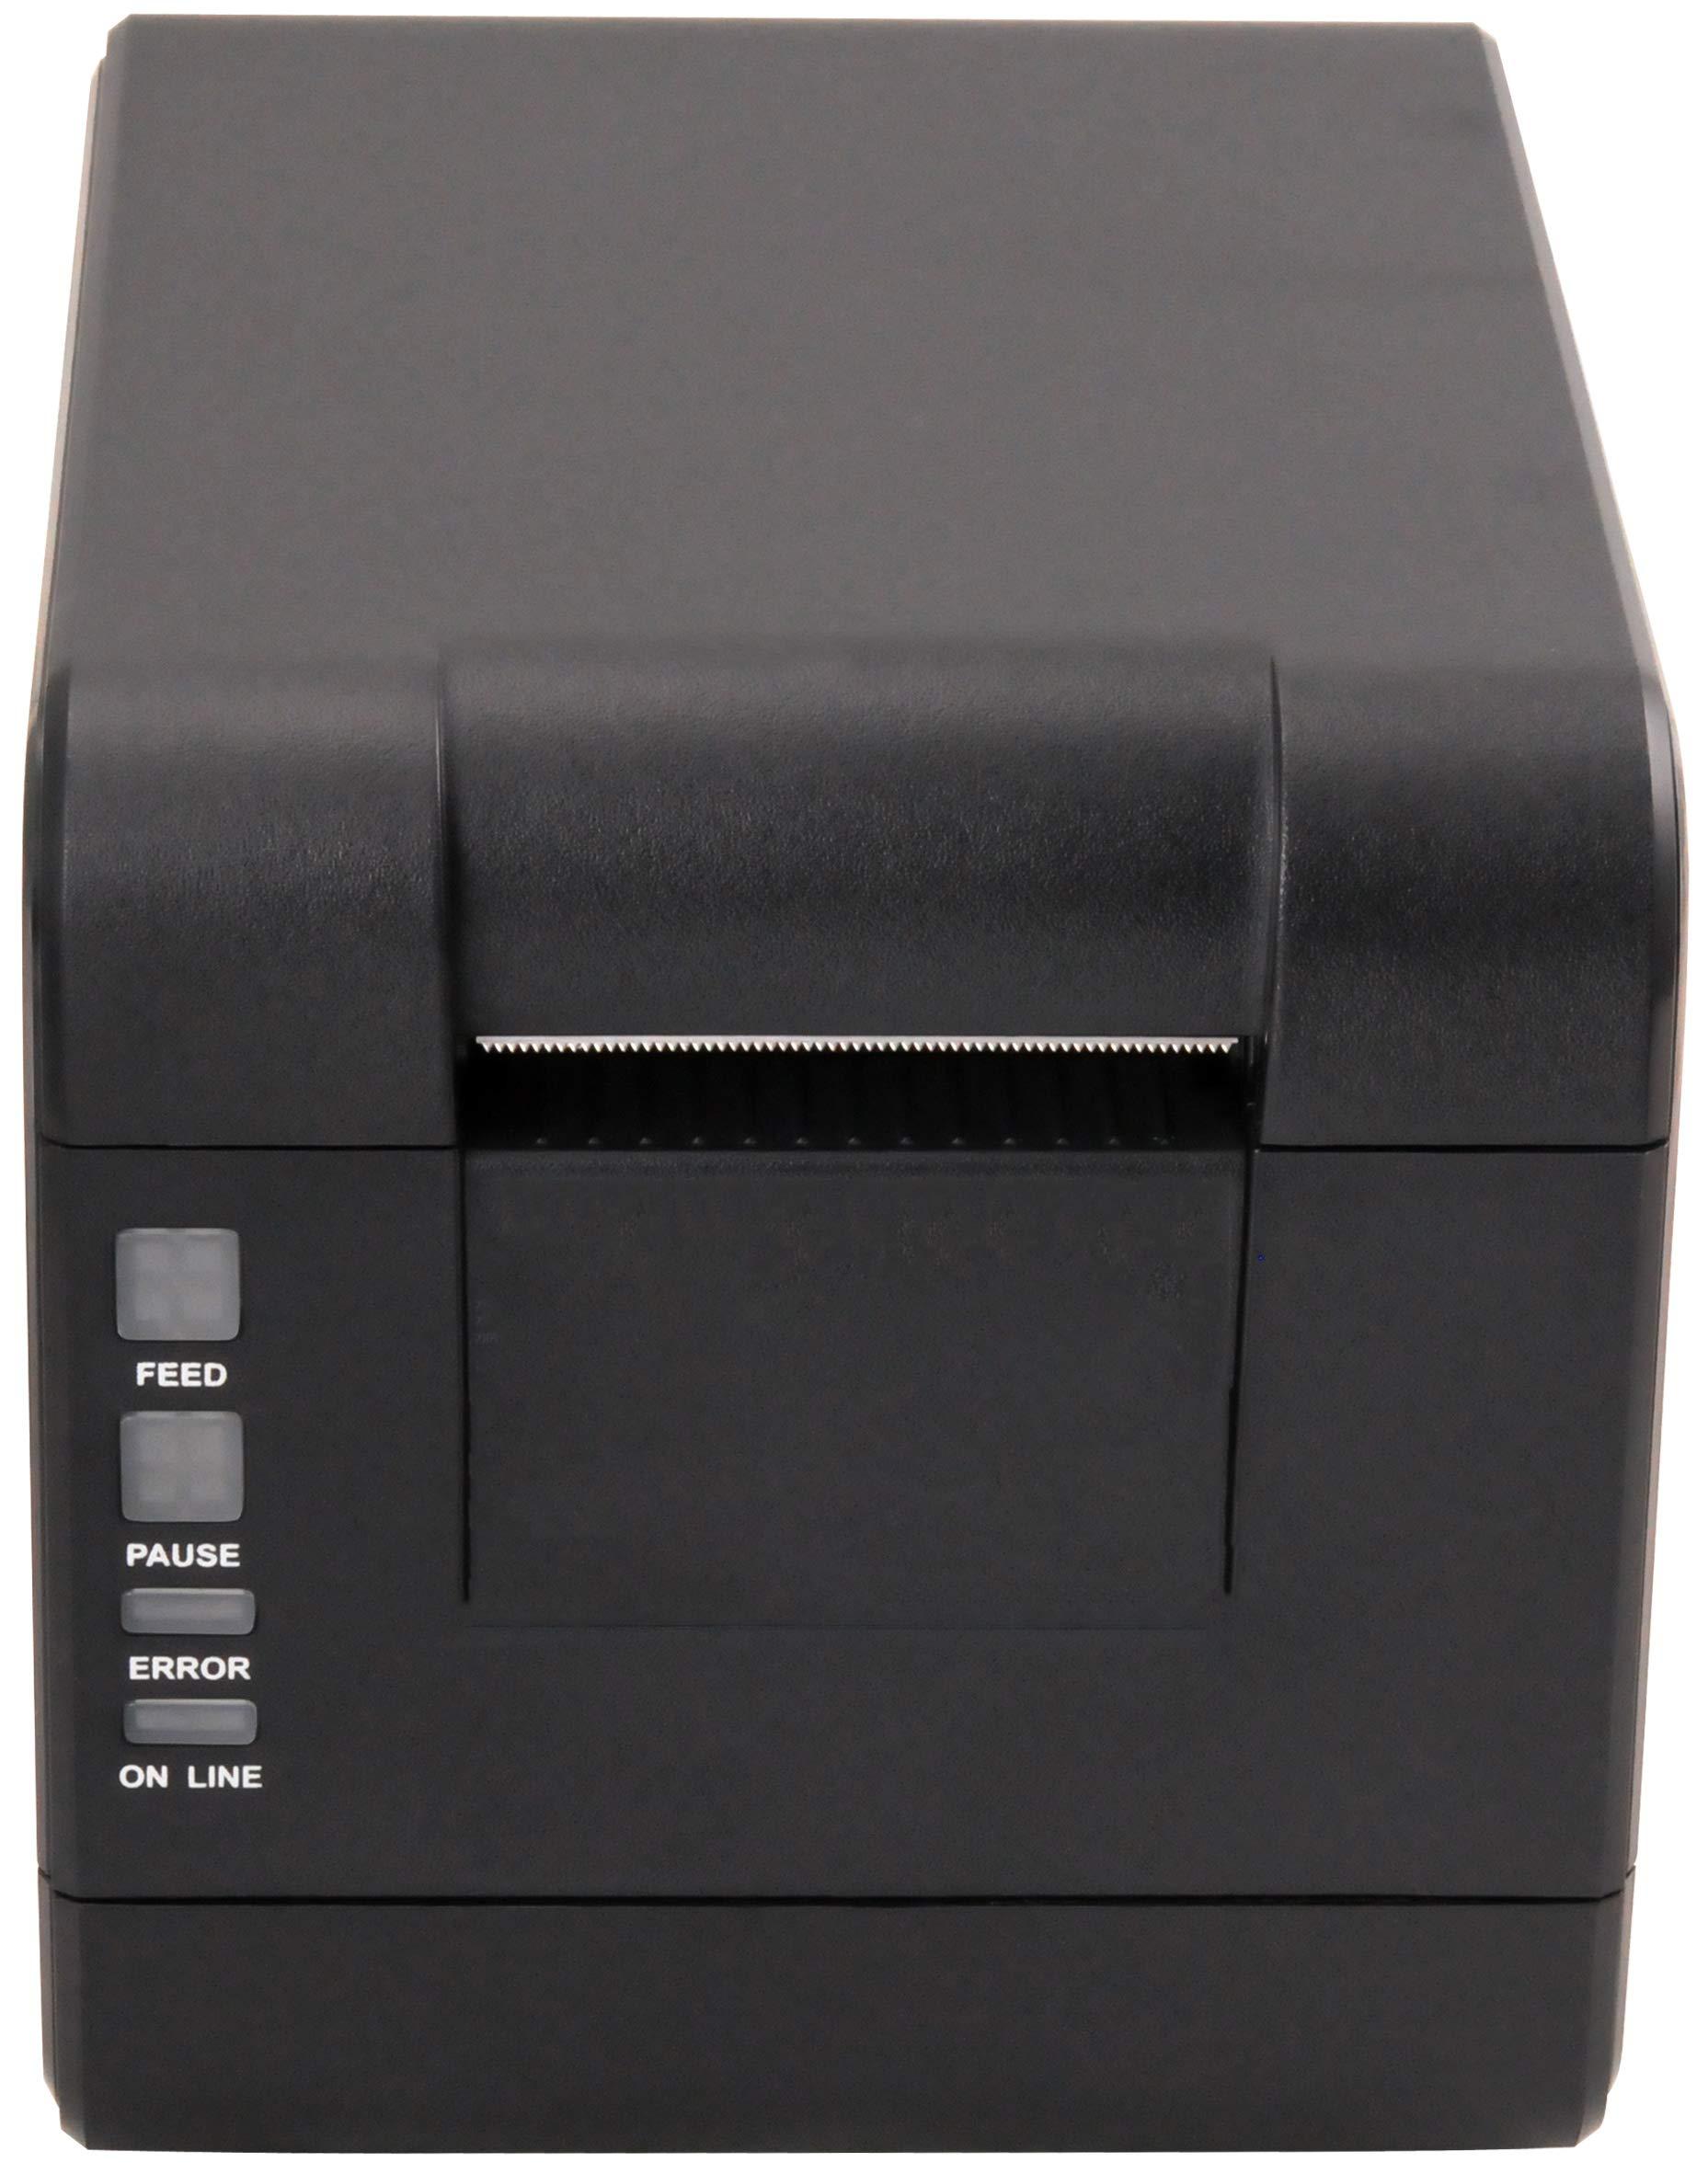 Xprinter XP-233B 58mm Thermal Label Printer,Thermal Barcode Printer, USB 2.0 Interface, 101mm/s Print Speed, Black